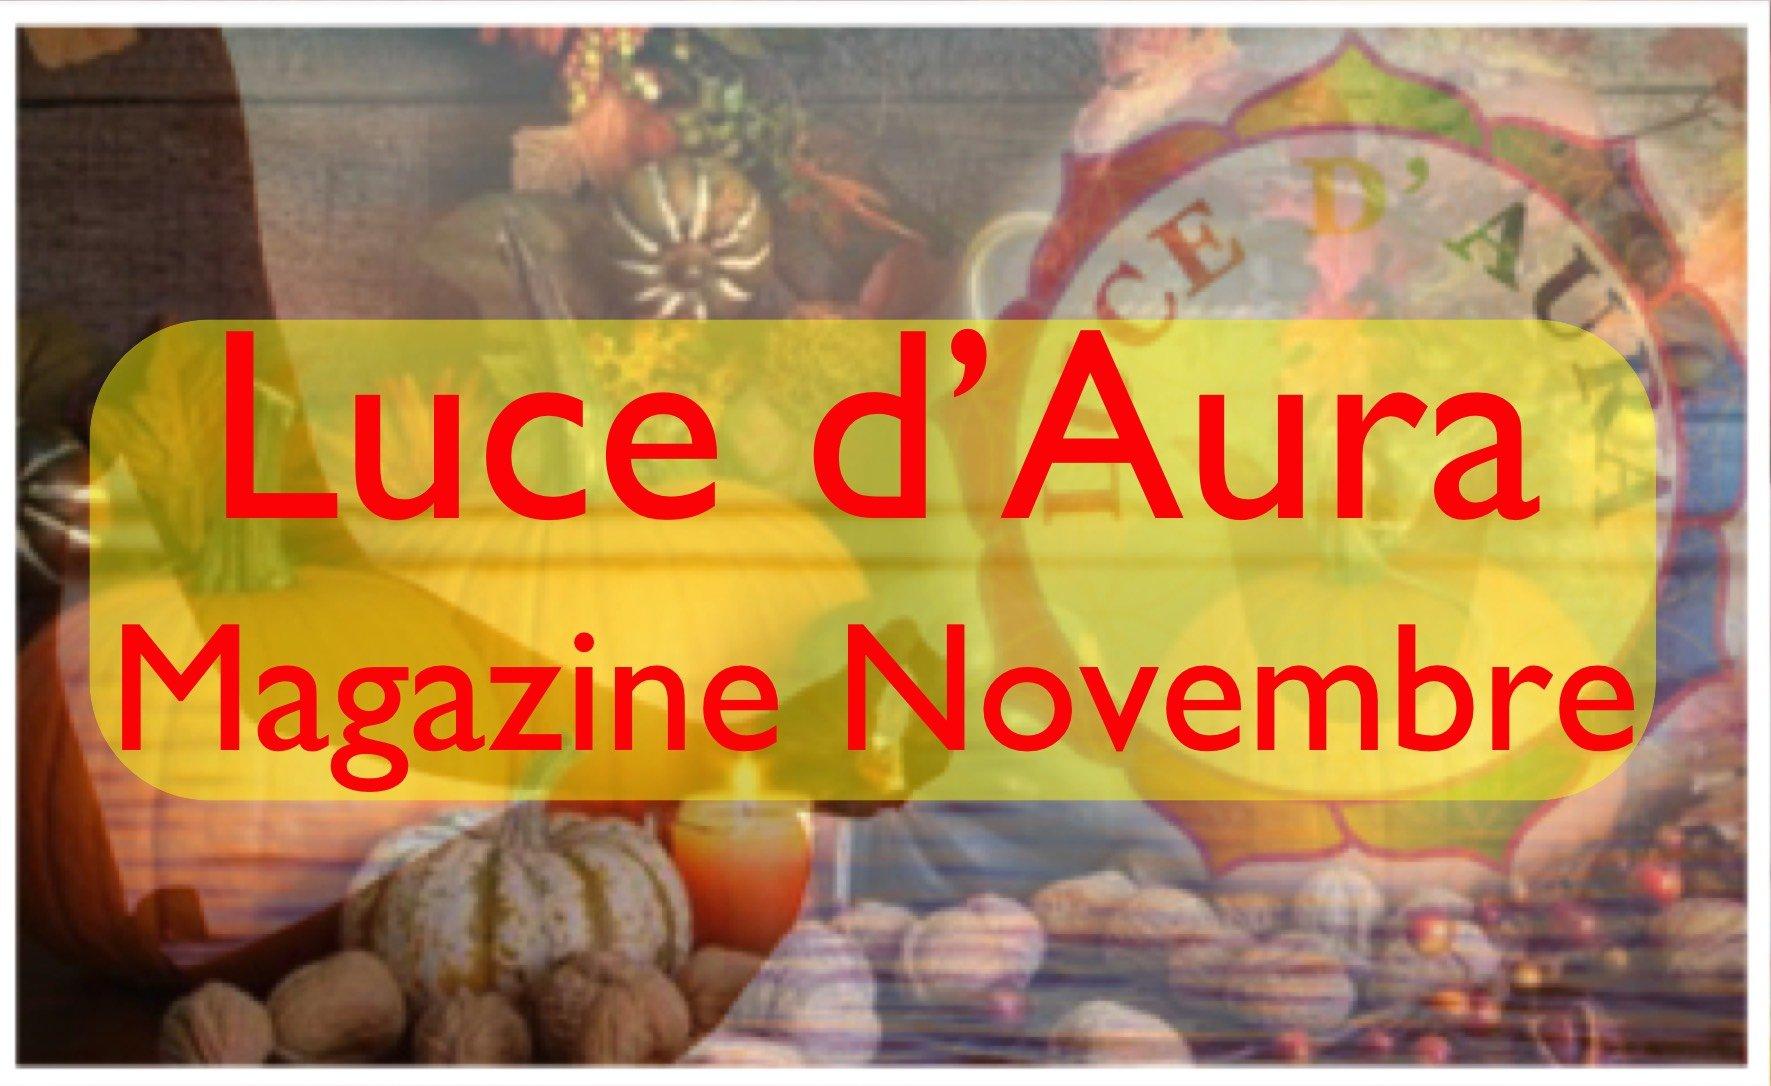 Luce d'Aura Magazine Novembre